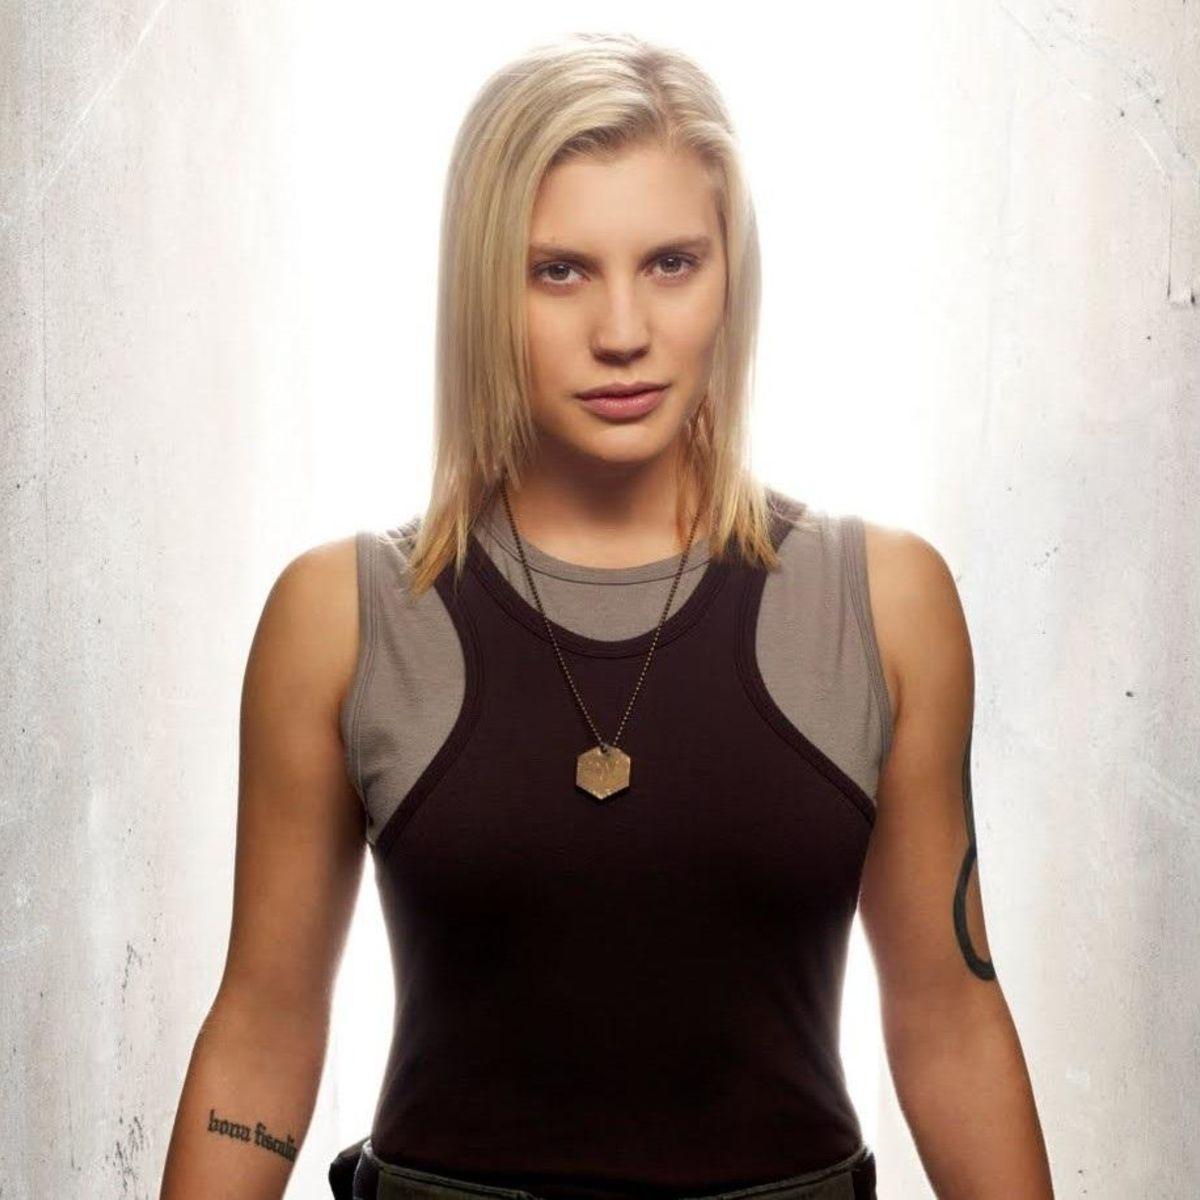 Battlestar Galactic's Katee Sackhoff signs on to star in Origin Unknown